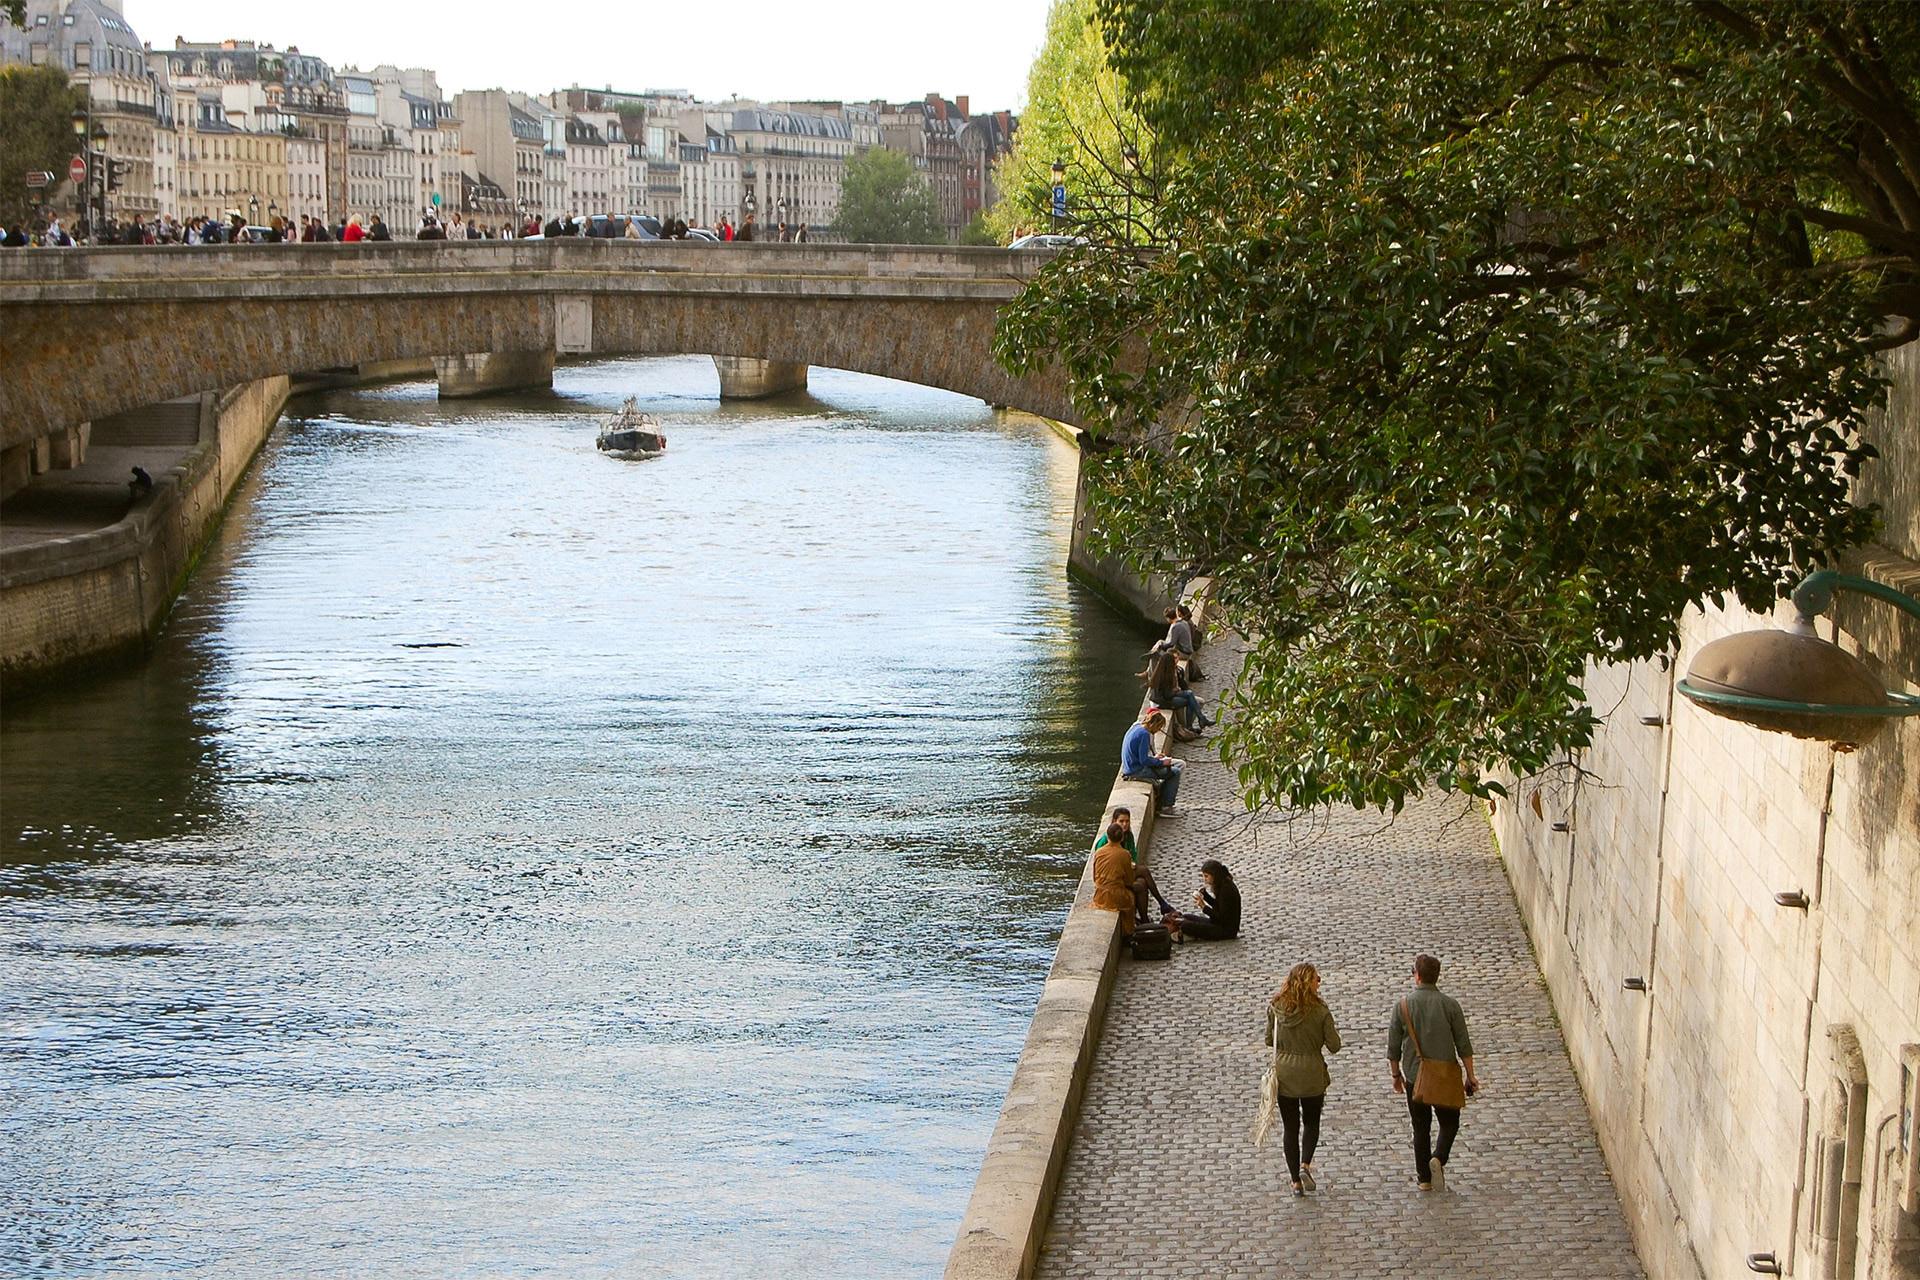 Riverbank of the Seine in Paris